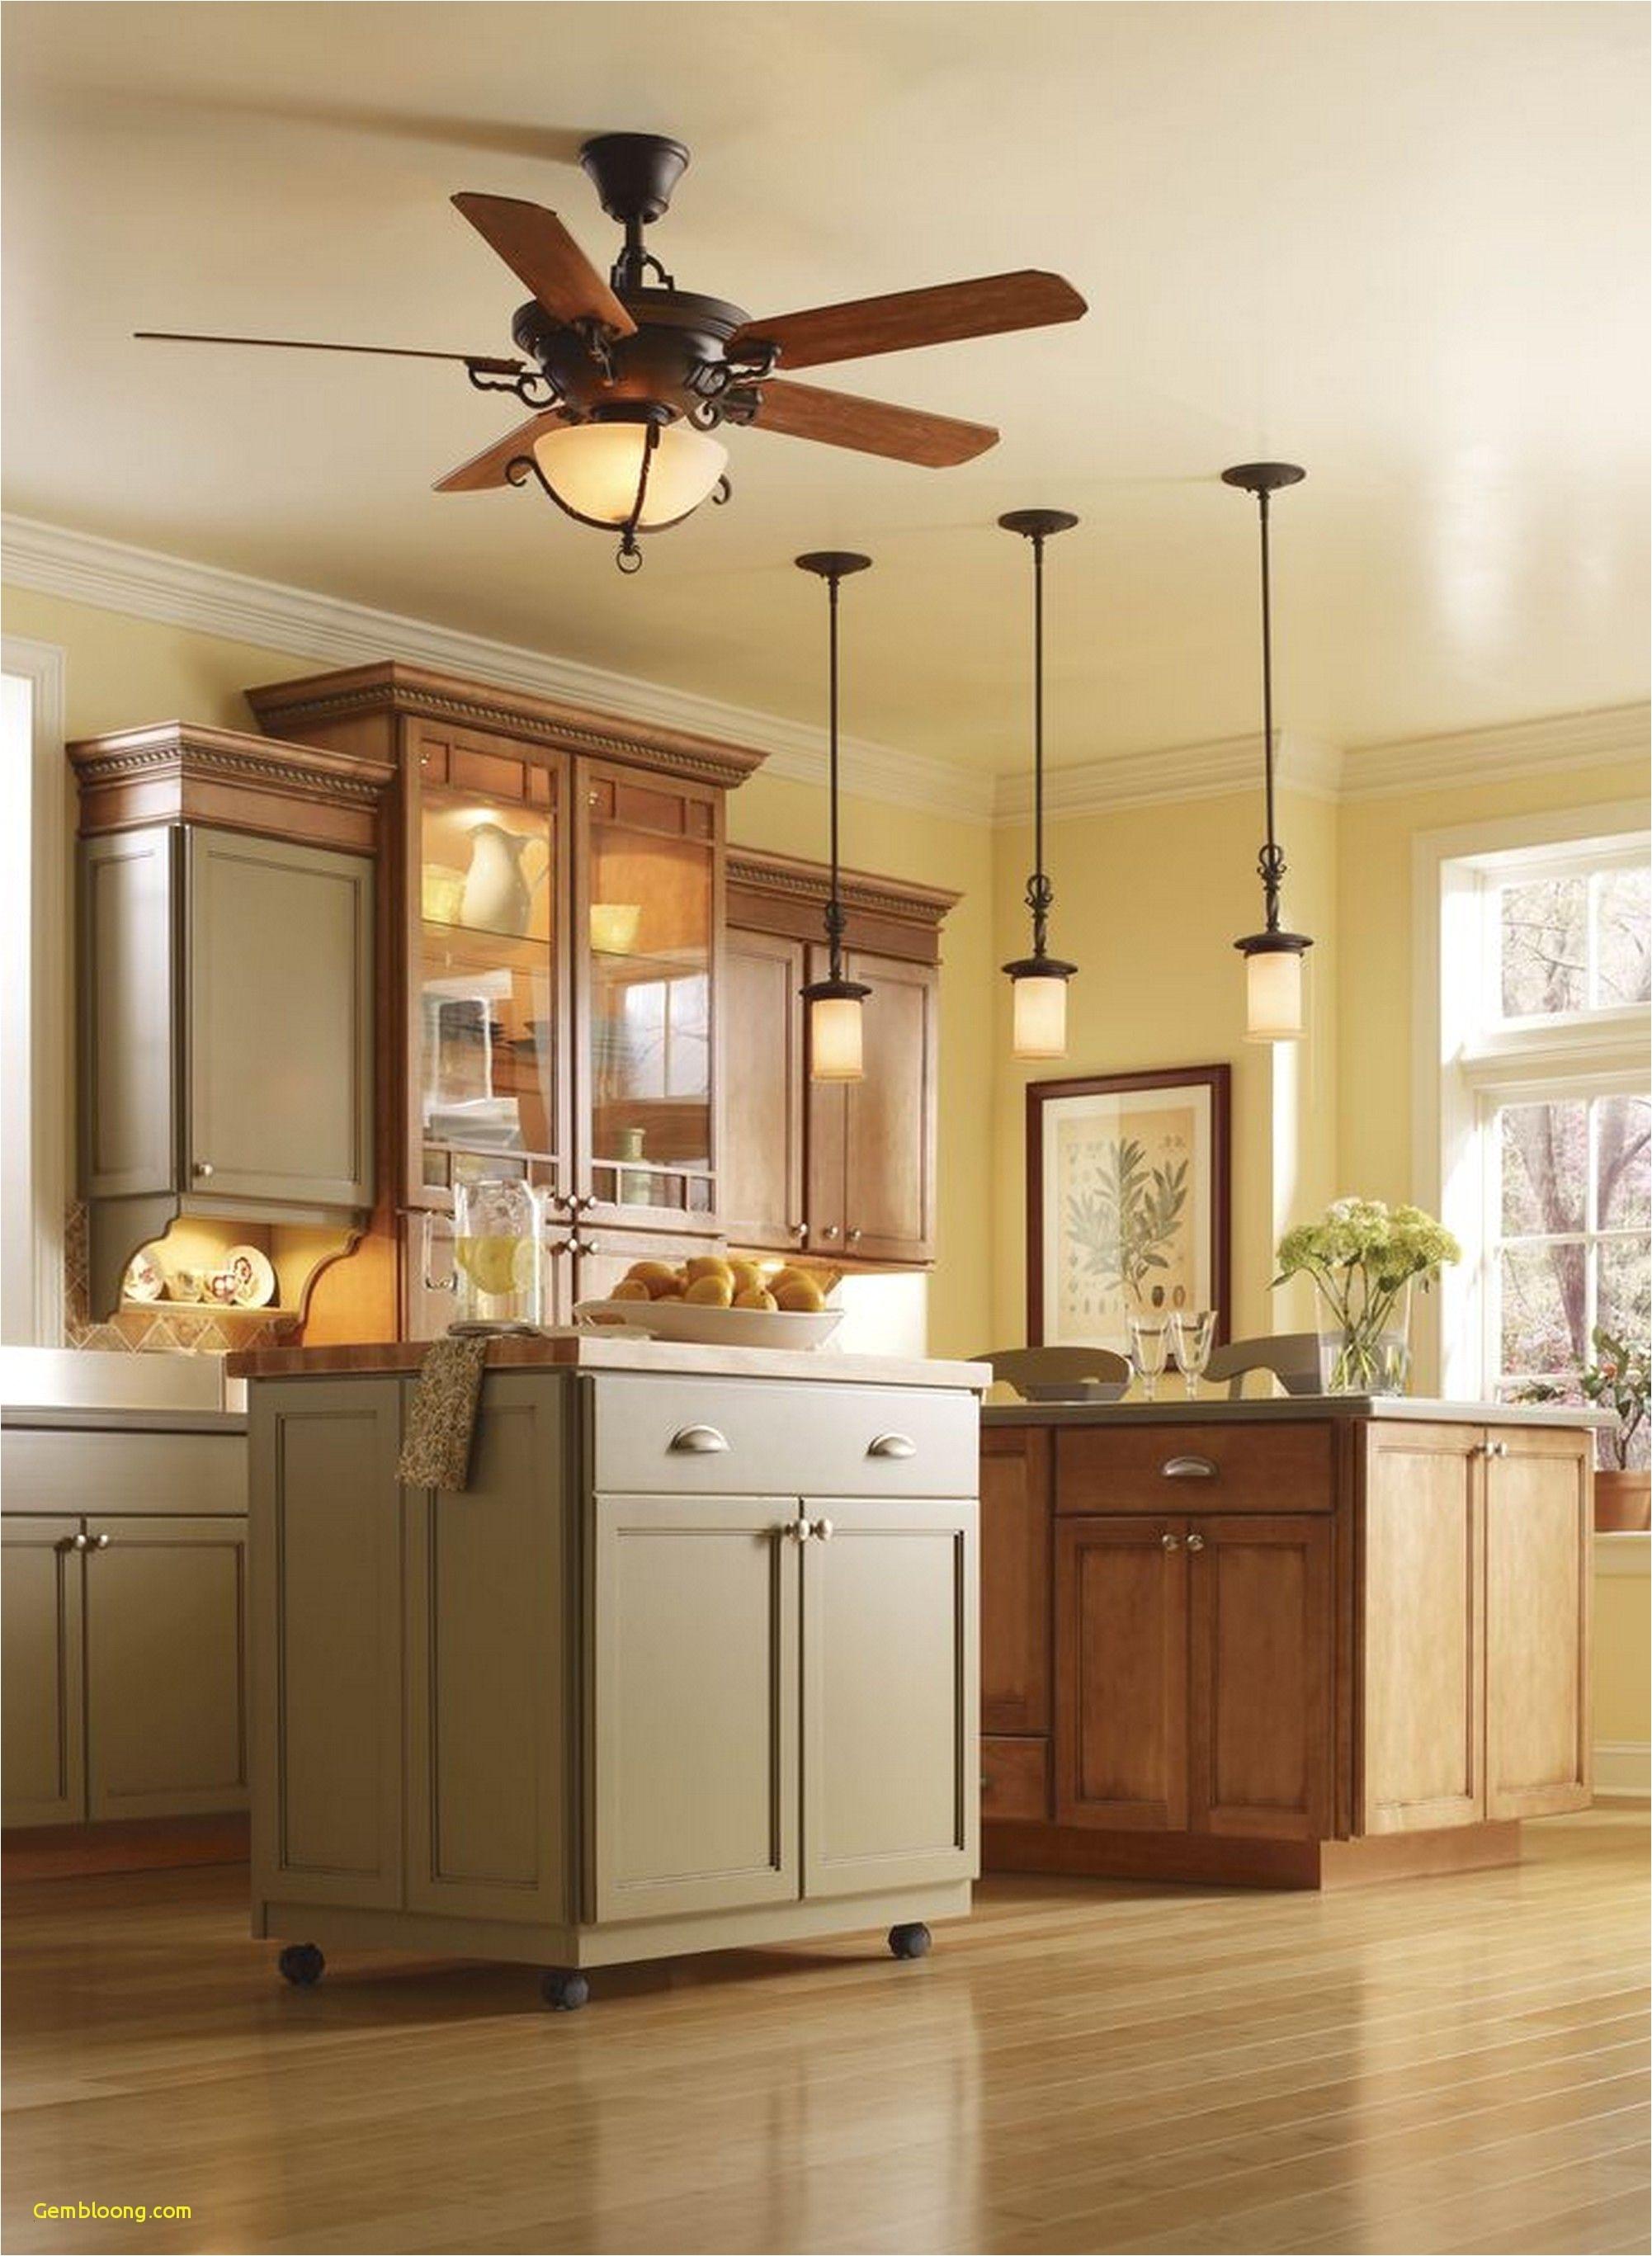 big ass ceiling fan inspirational luxury kitchen ceiling fan with light terranovaenergyltd